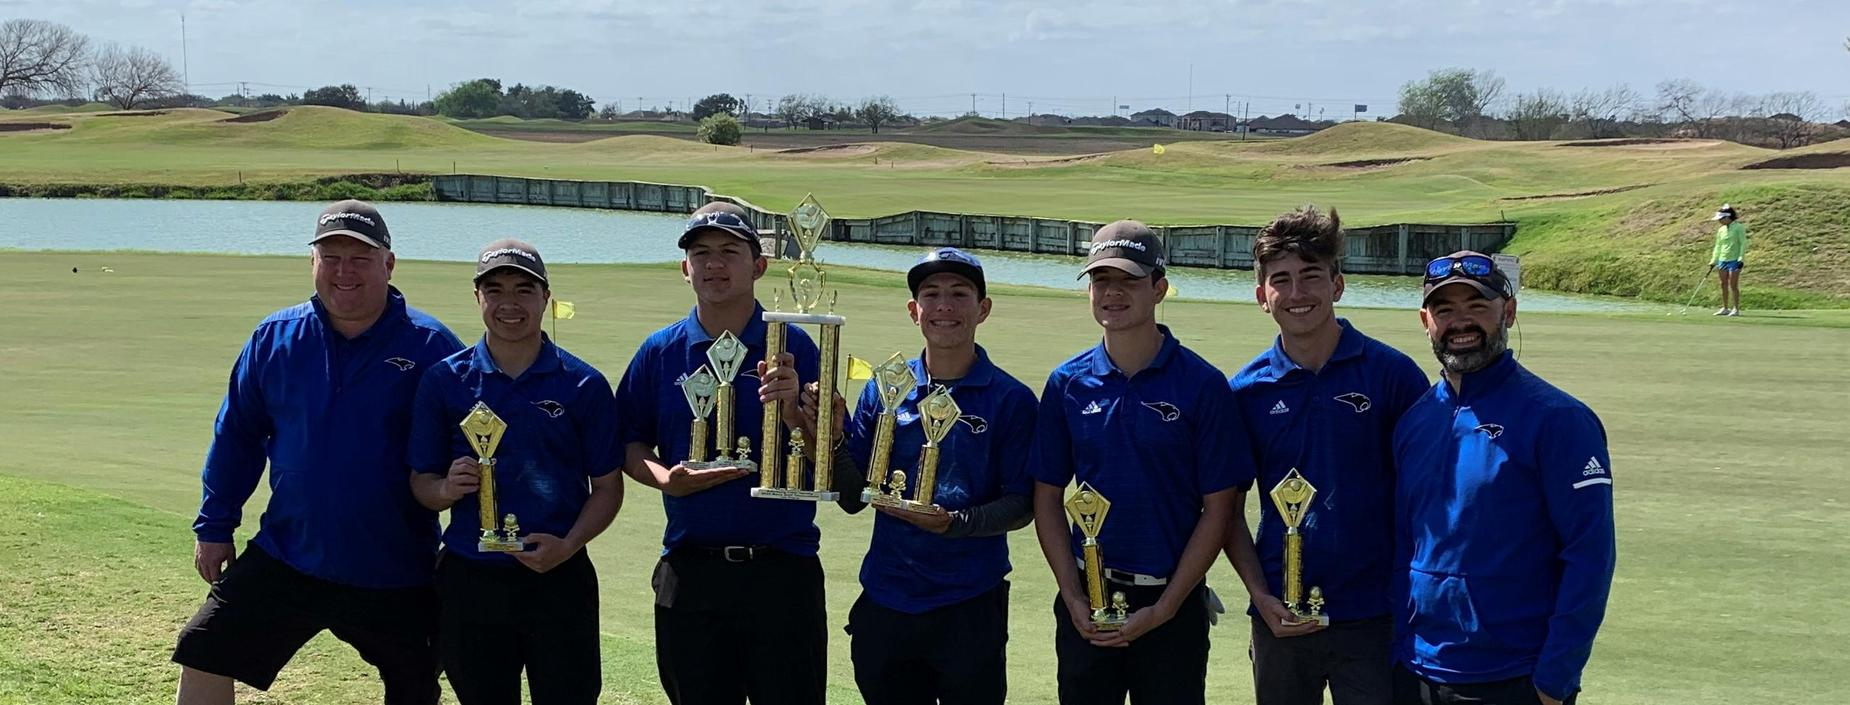 ECISD Golf Tournament, RVHS 1st Place Overall.  Pictured left to right: Coach Cory Mayes, Darian Gonzalez, Ruben Vasquez, Ethan Ayala, Julian Guevara, James Salinas, Coach Eloy Falcon